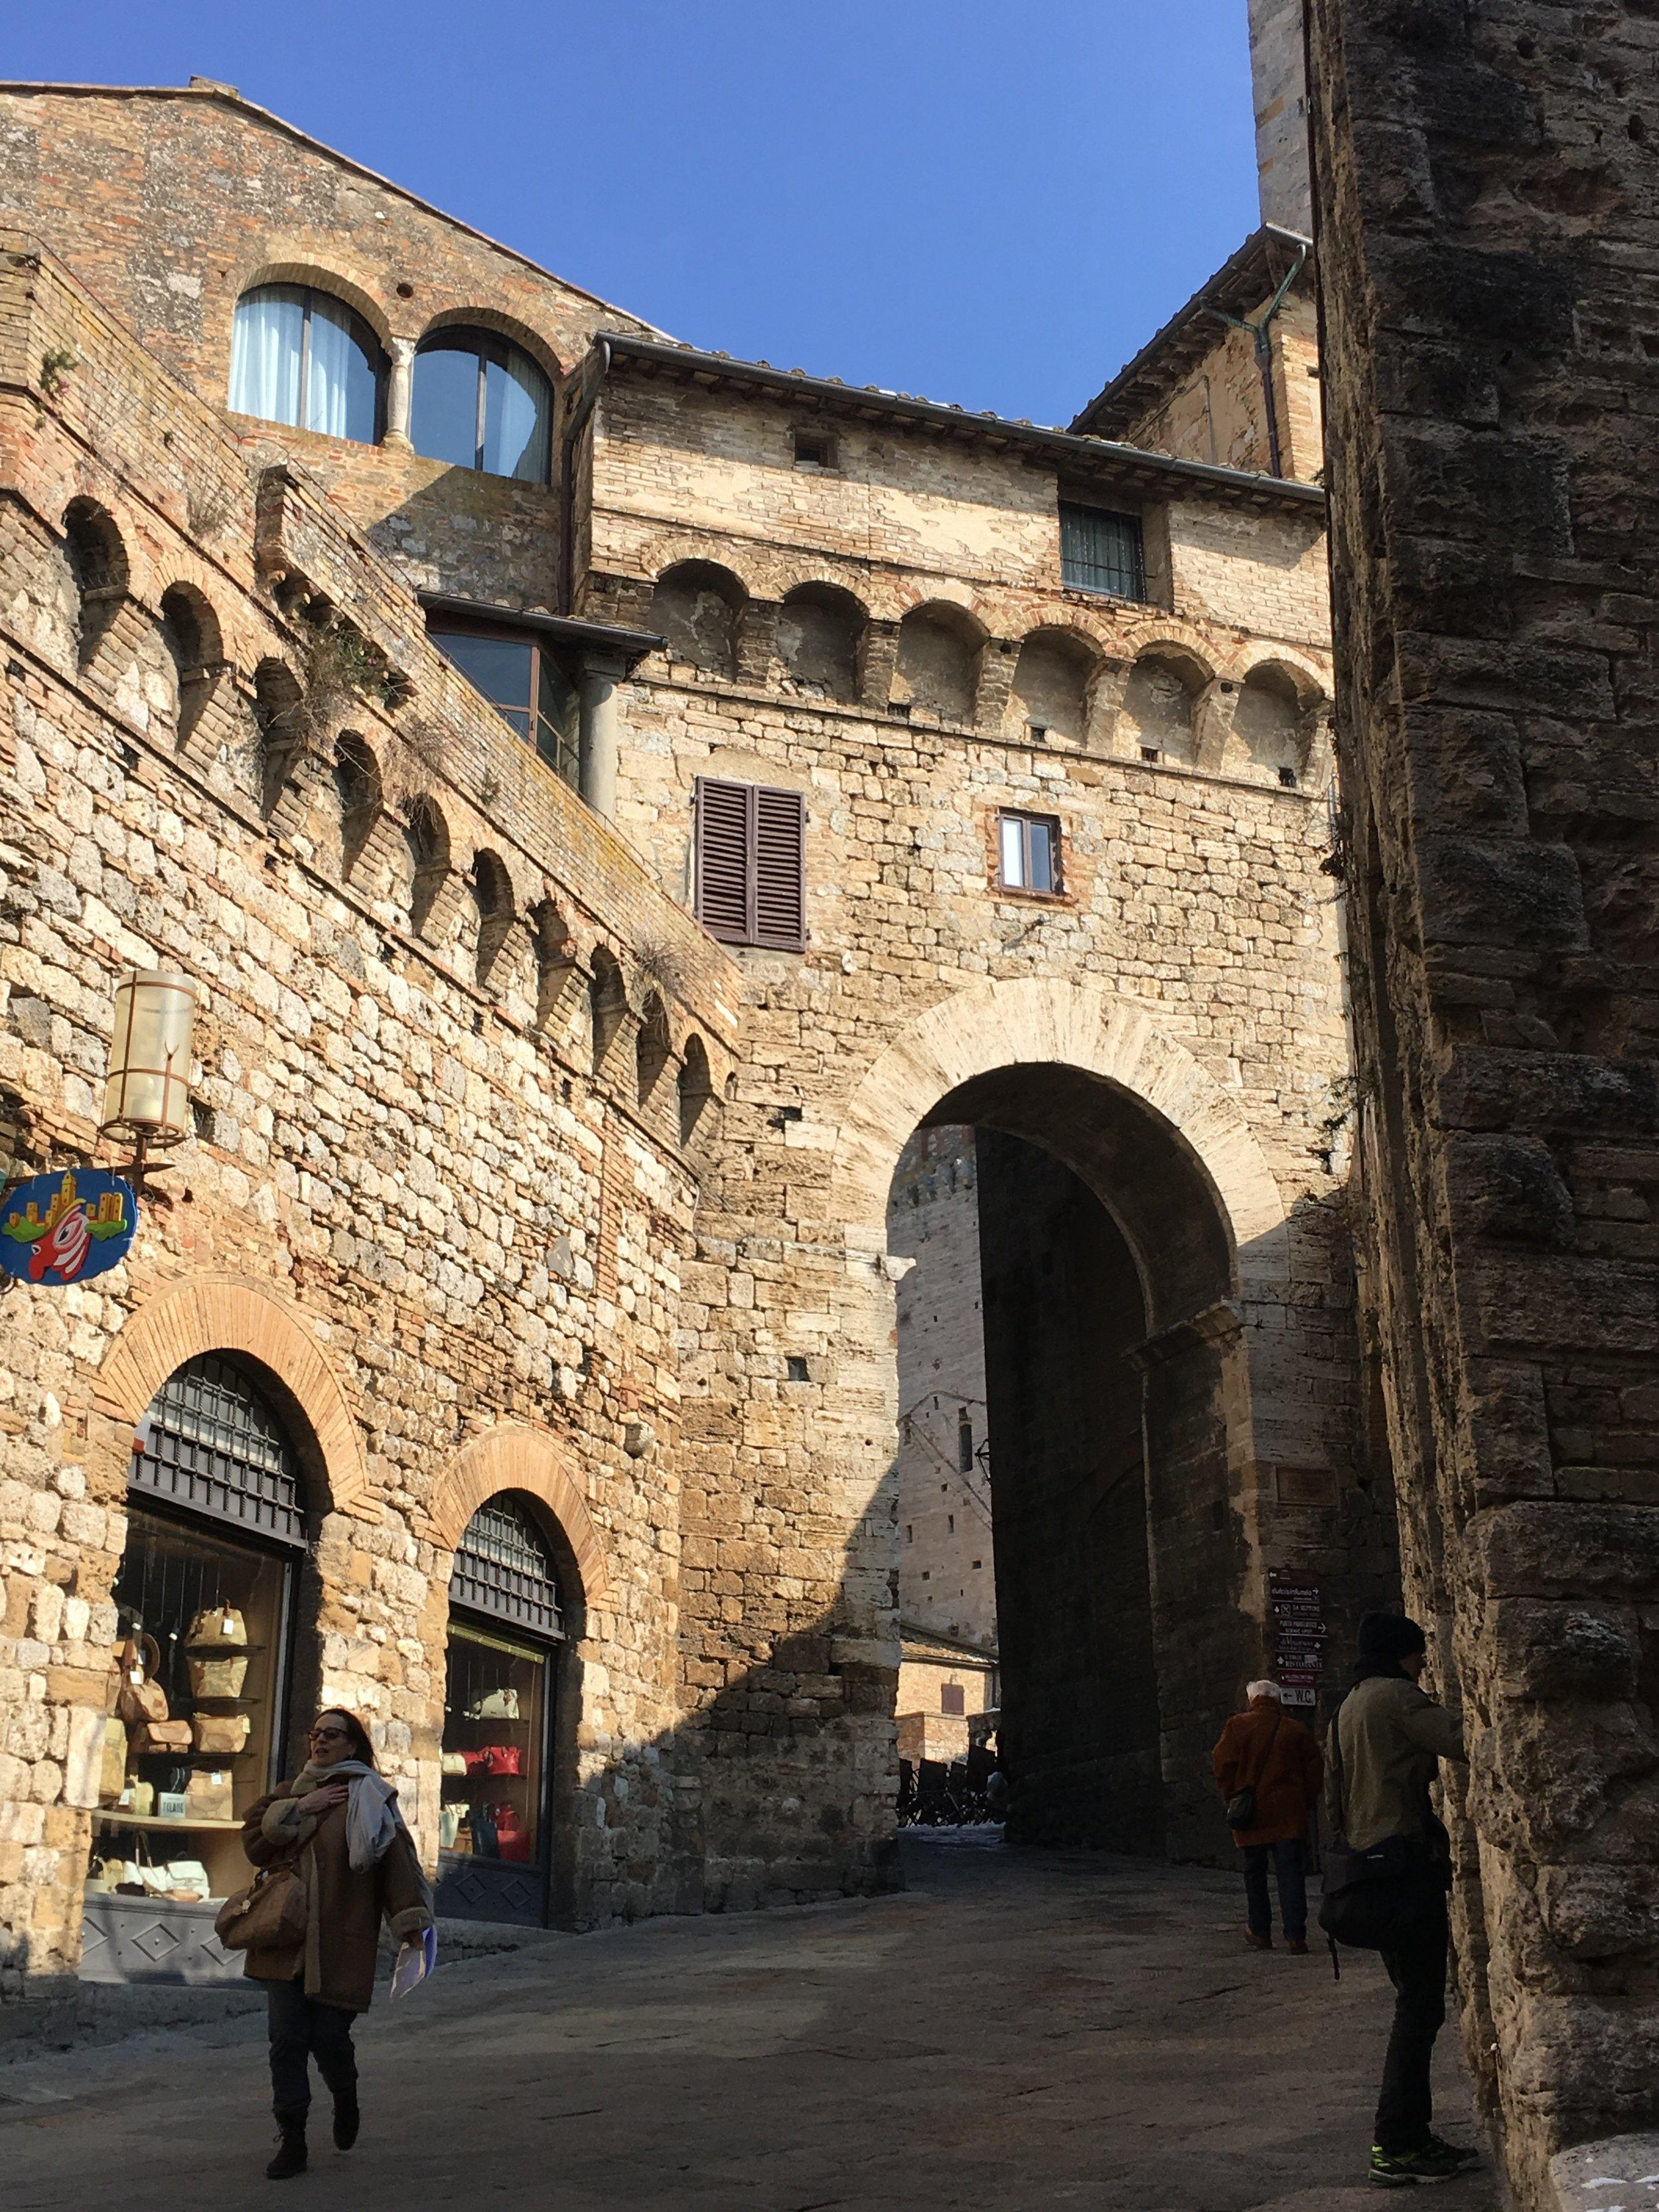 A Medieval street in San Gimignano